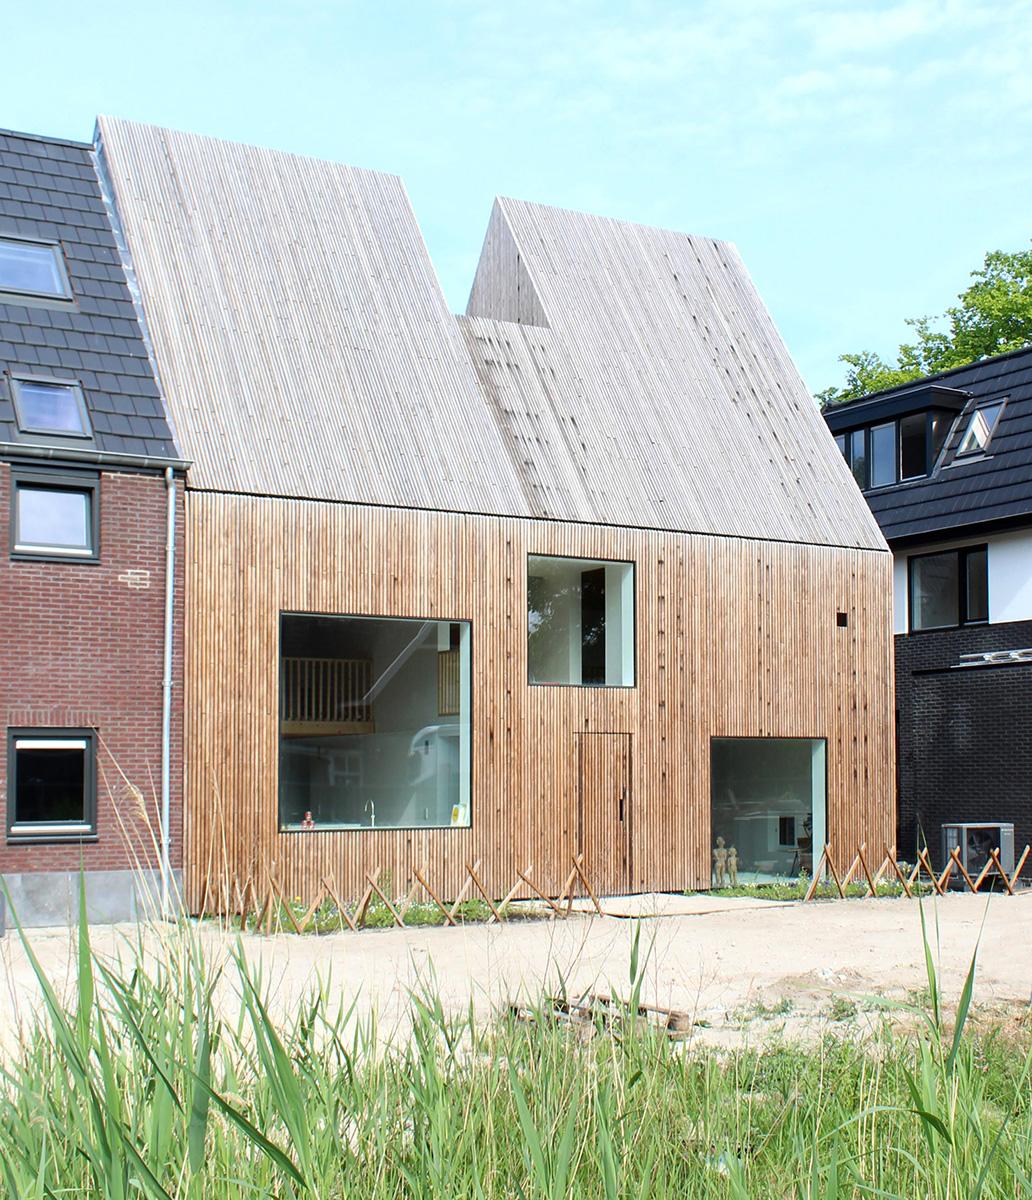 Rhythm-House-Julius-Taminiau-Architects-Norbert-Wunderling-02